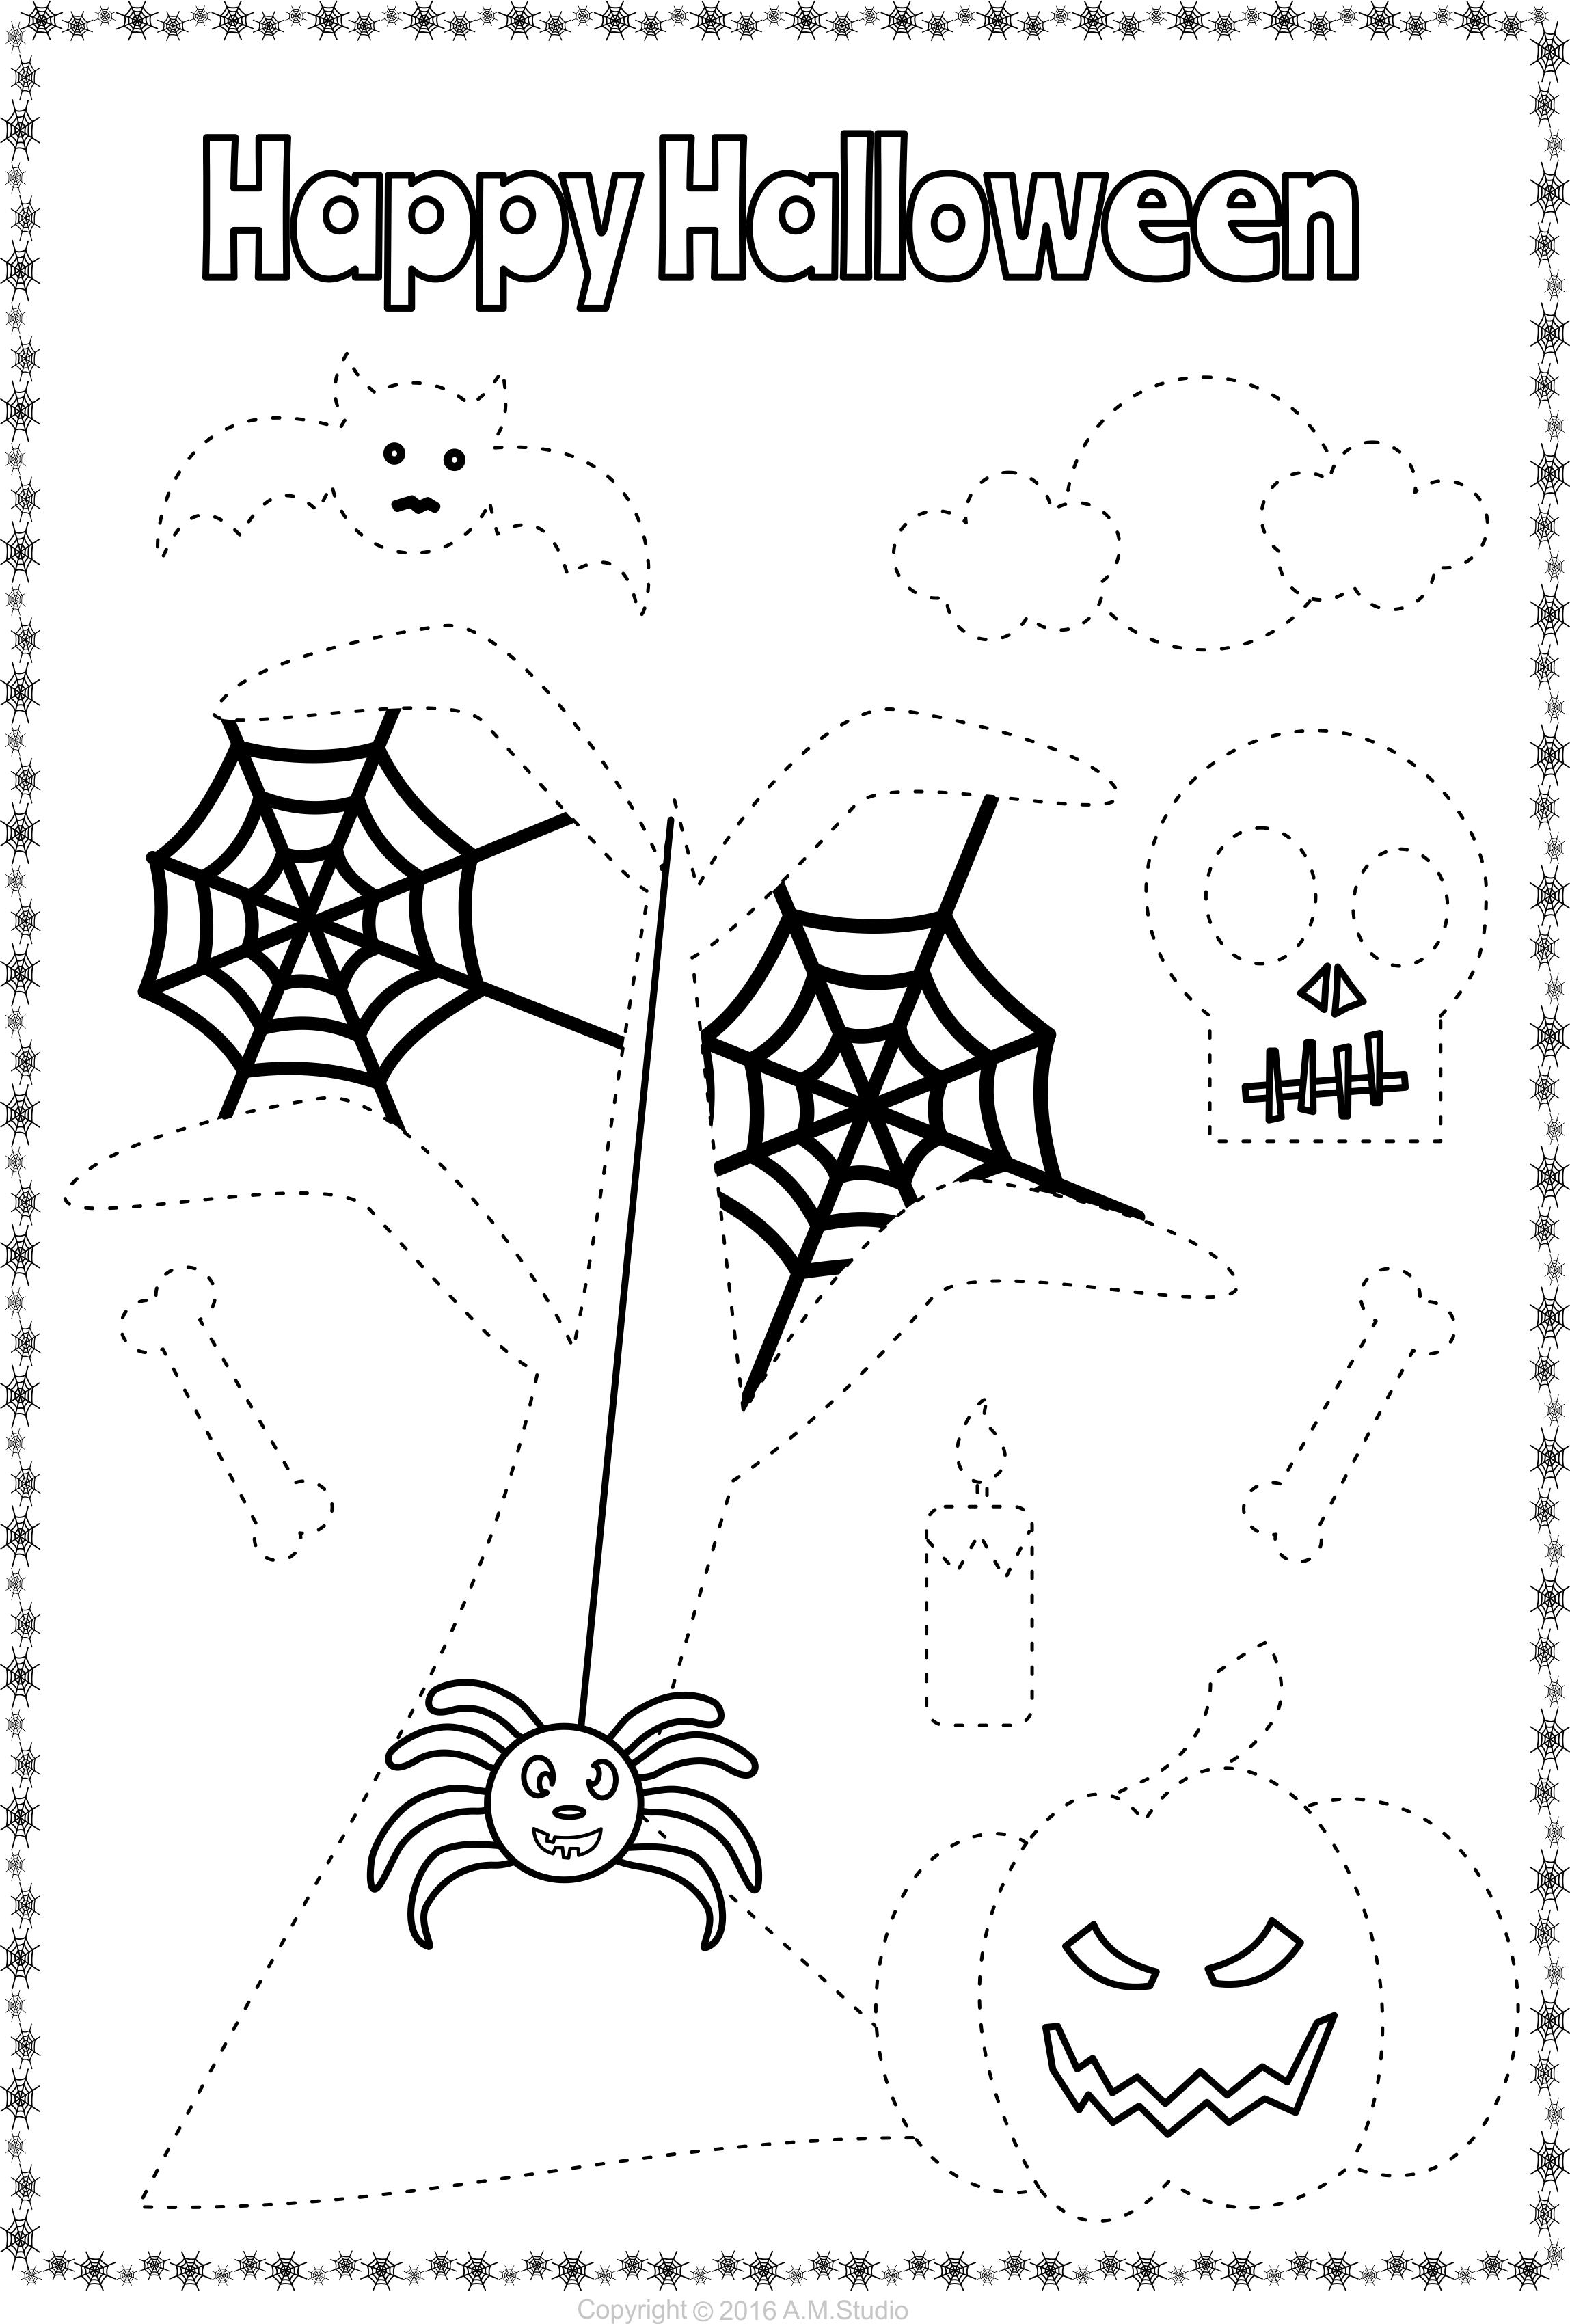 13 Halloween Themed Trace And Color Pages For Kids Halloween Activities Preschool Halloween Printables Kids Halloween Poems [ 3400 x 2297 Pixel ]